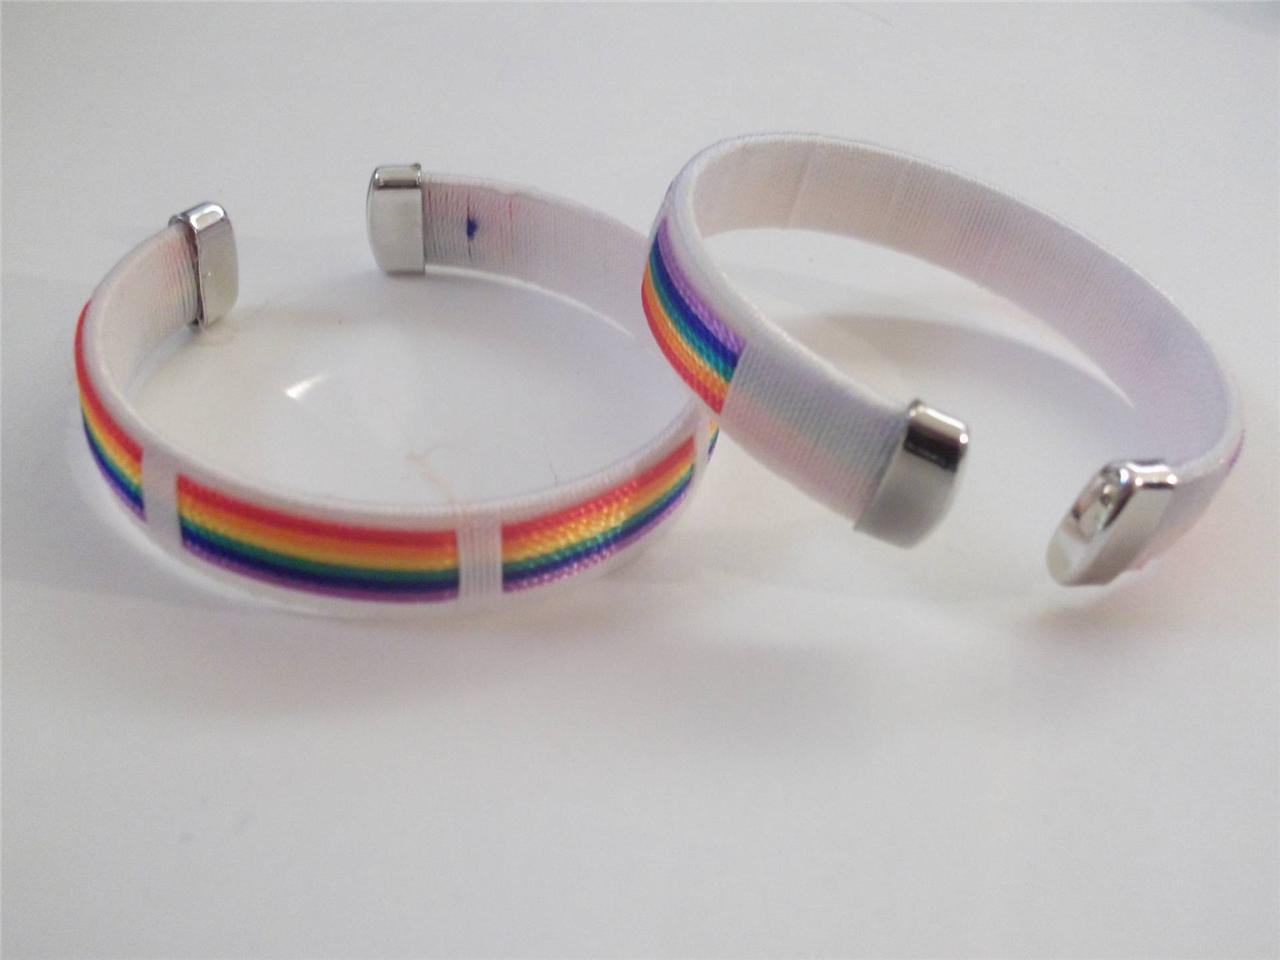 2pc Rainbow Bracelet Flexible Band Bangles Bangle Wristband Pride Flag LGBT Lot